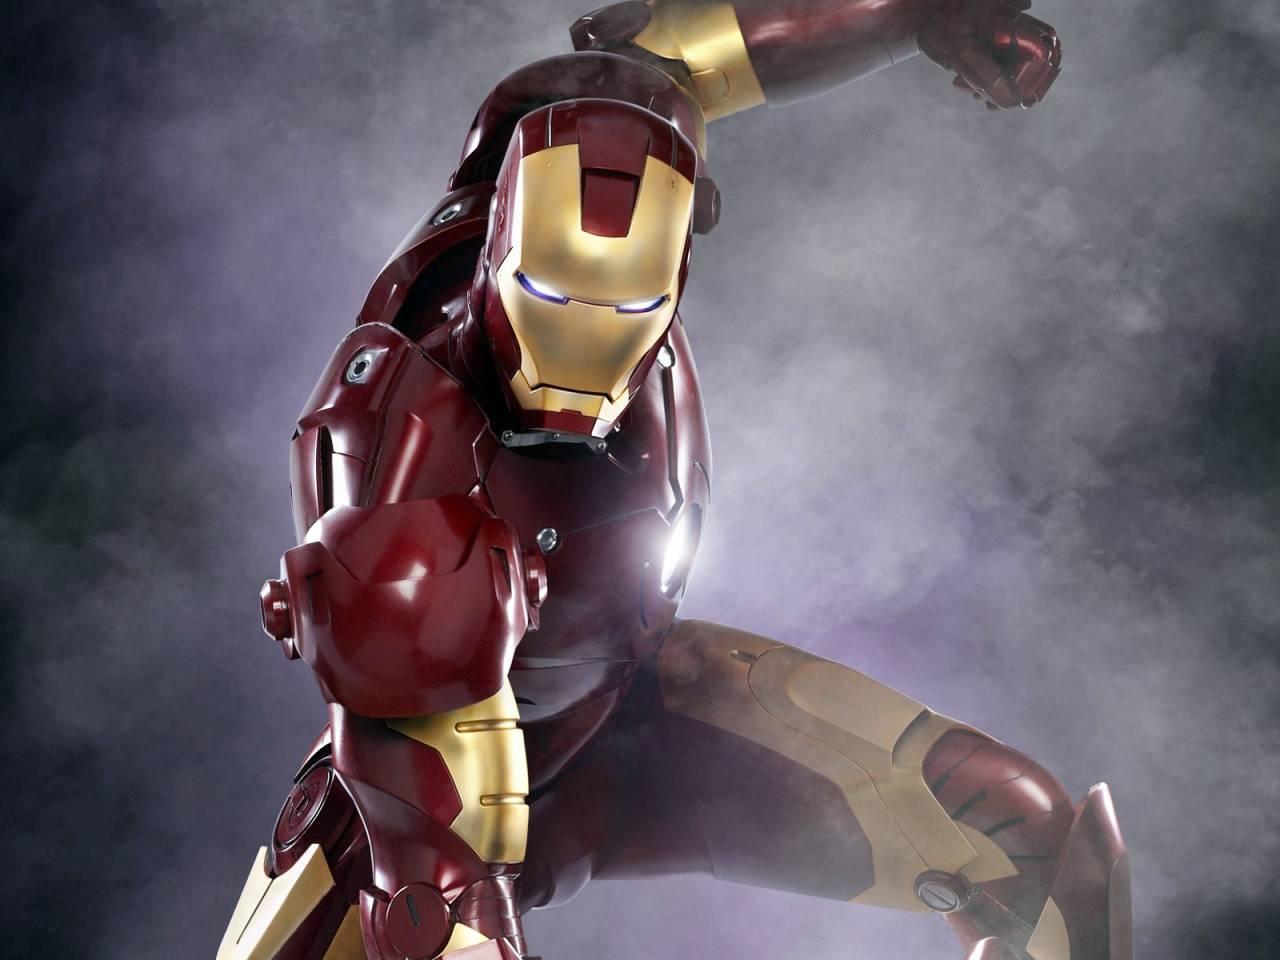 Iron Man Wallpaper 34447: Iron Man HD Wallpapers